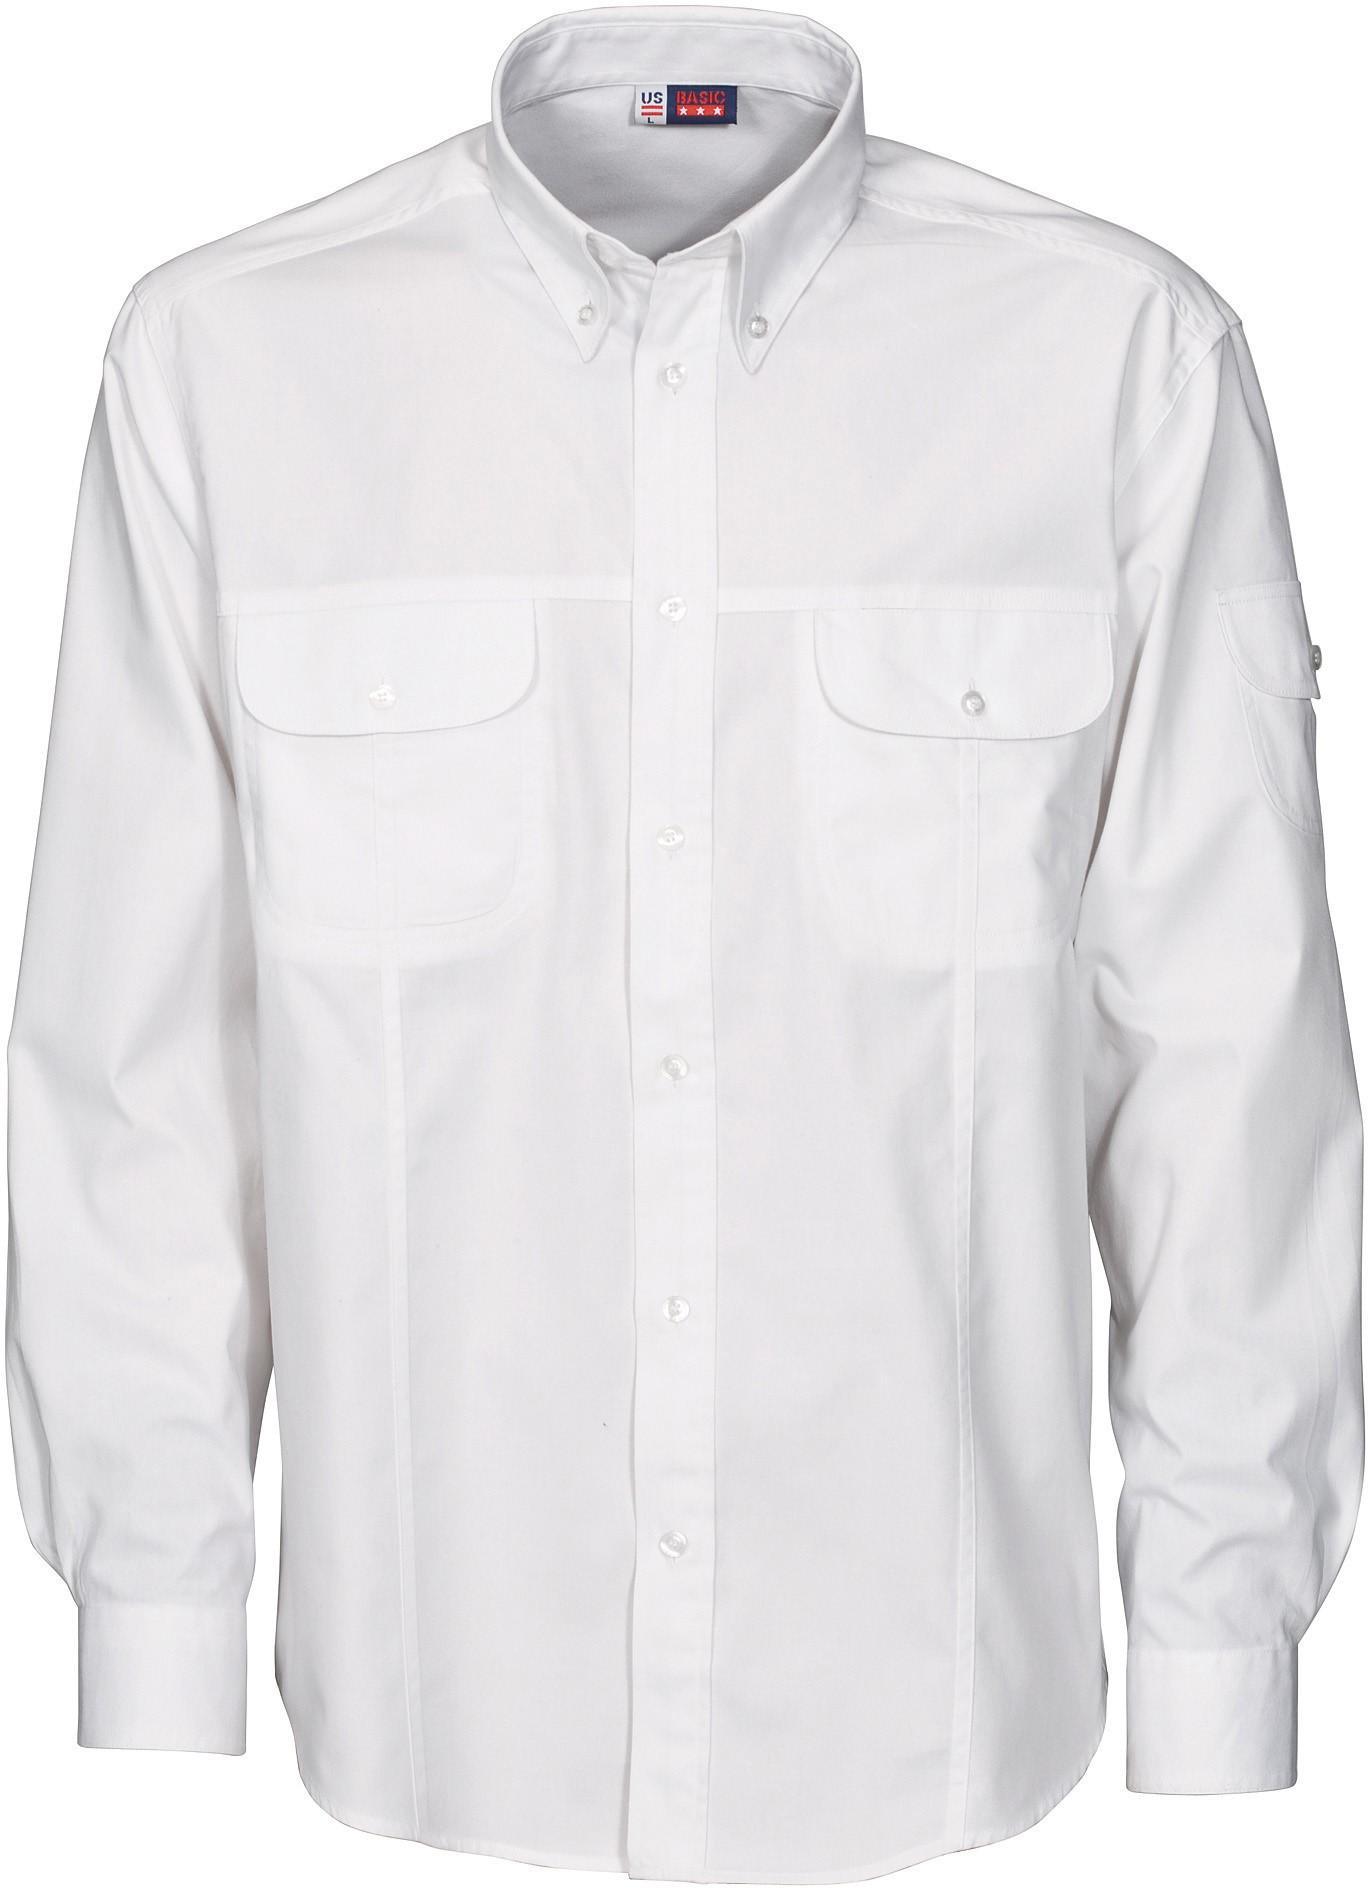 Mens Long Sleeve Phoenix Shirt - White Only